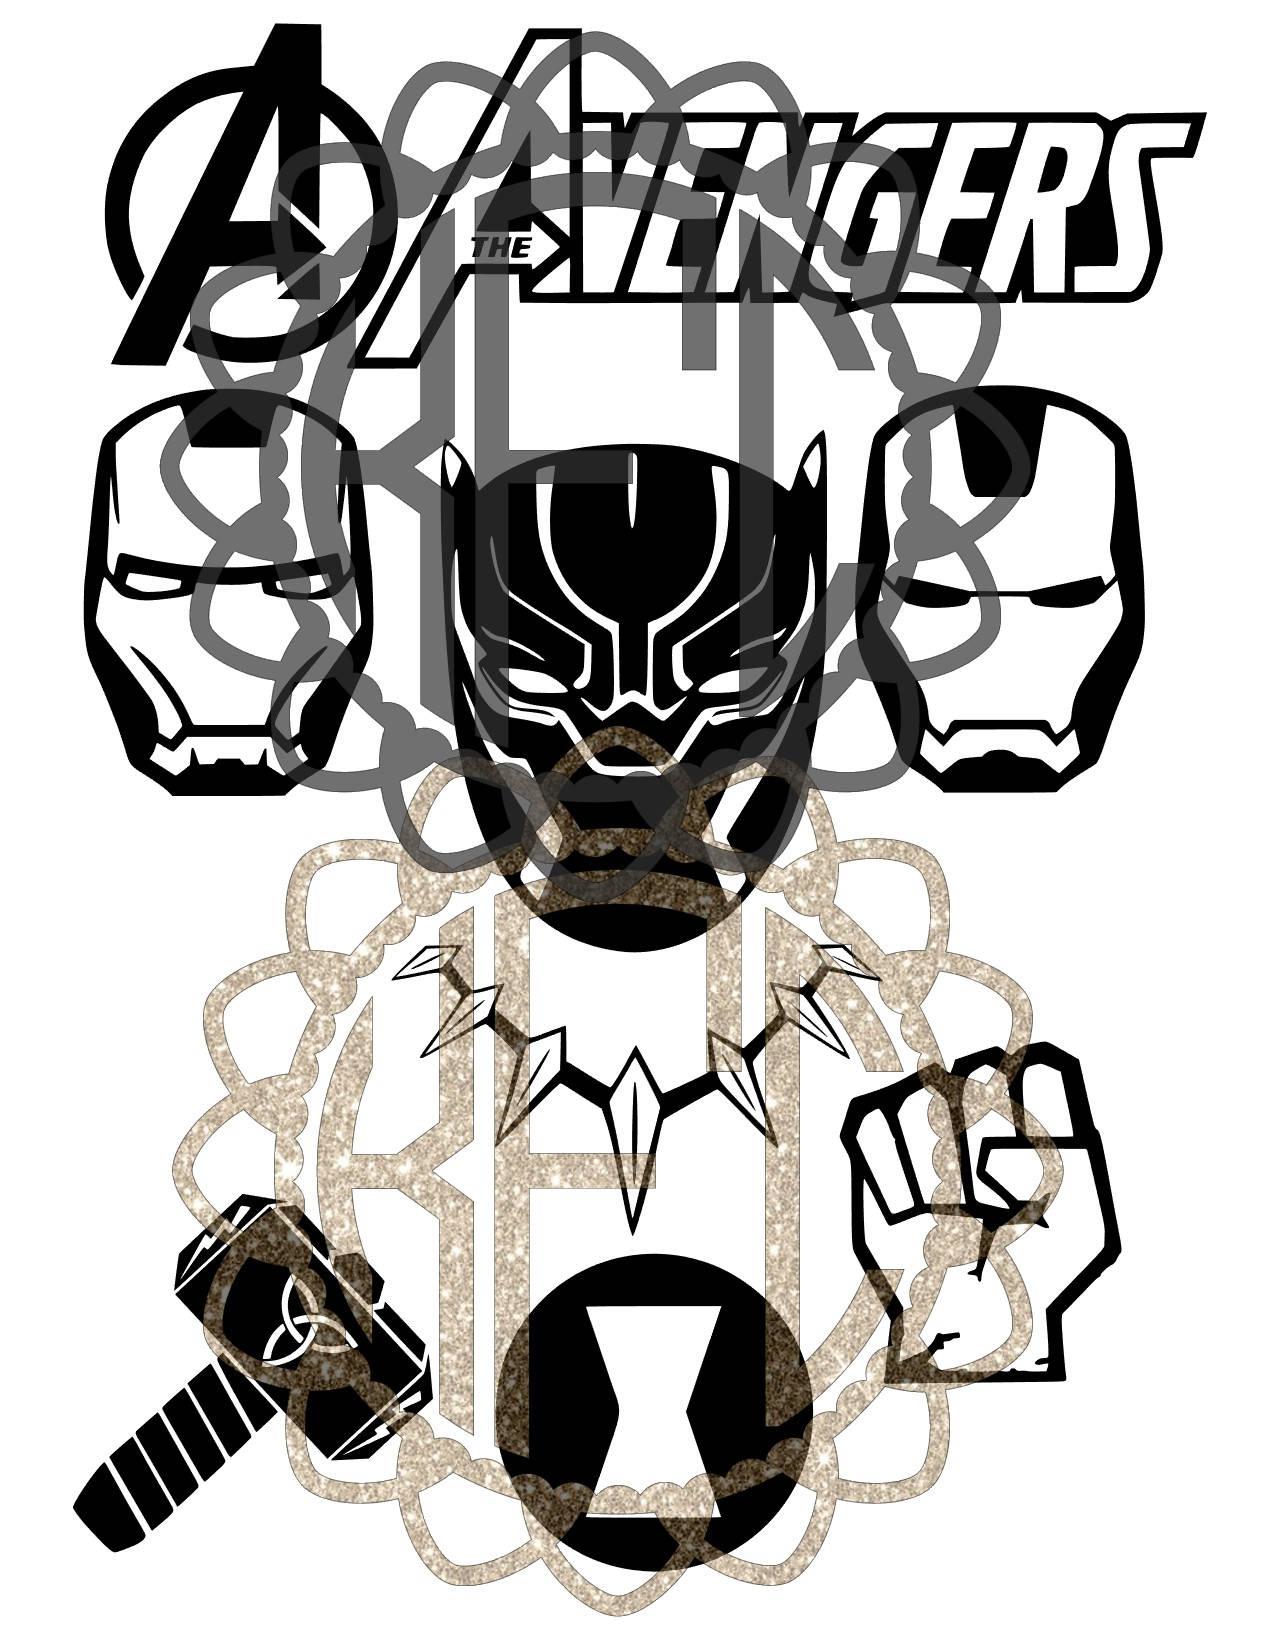 1275x1650 Avengers Black Panther Infinity War Logo Bundle! Great Deal! Eps